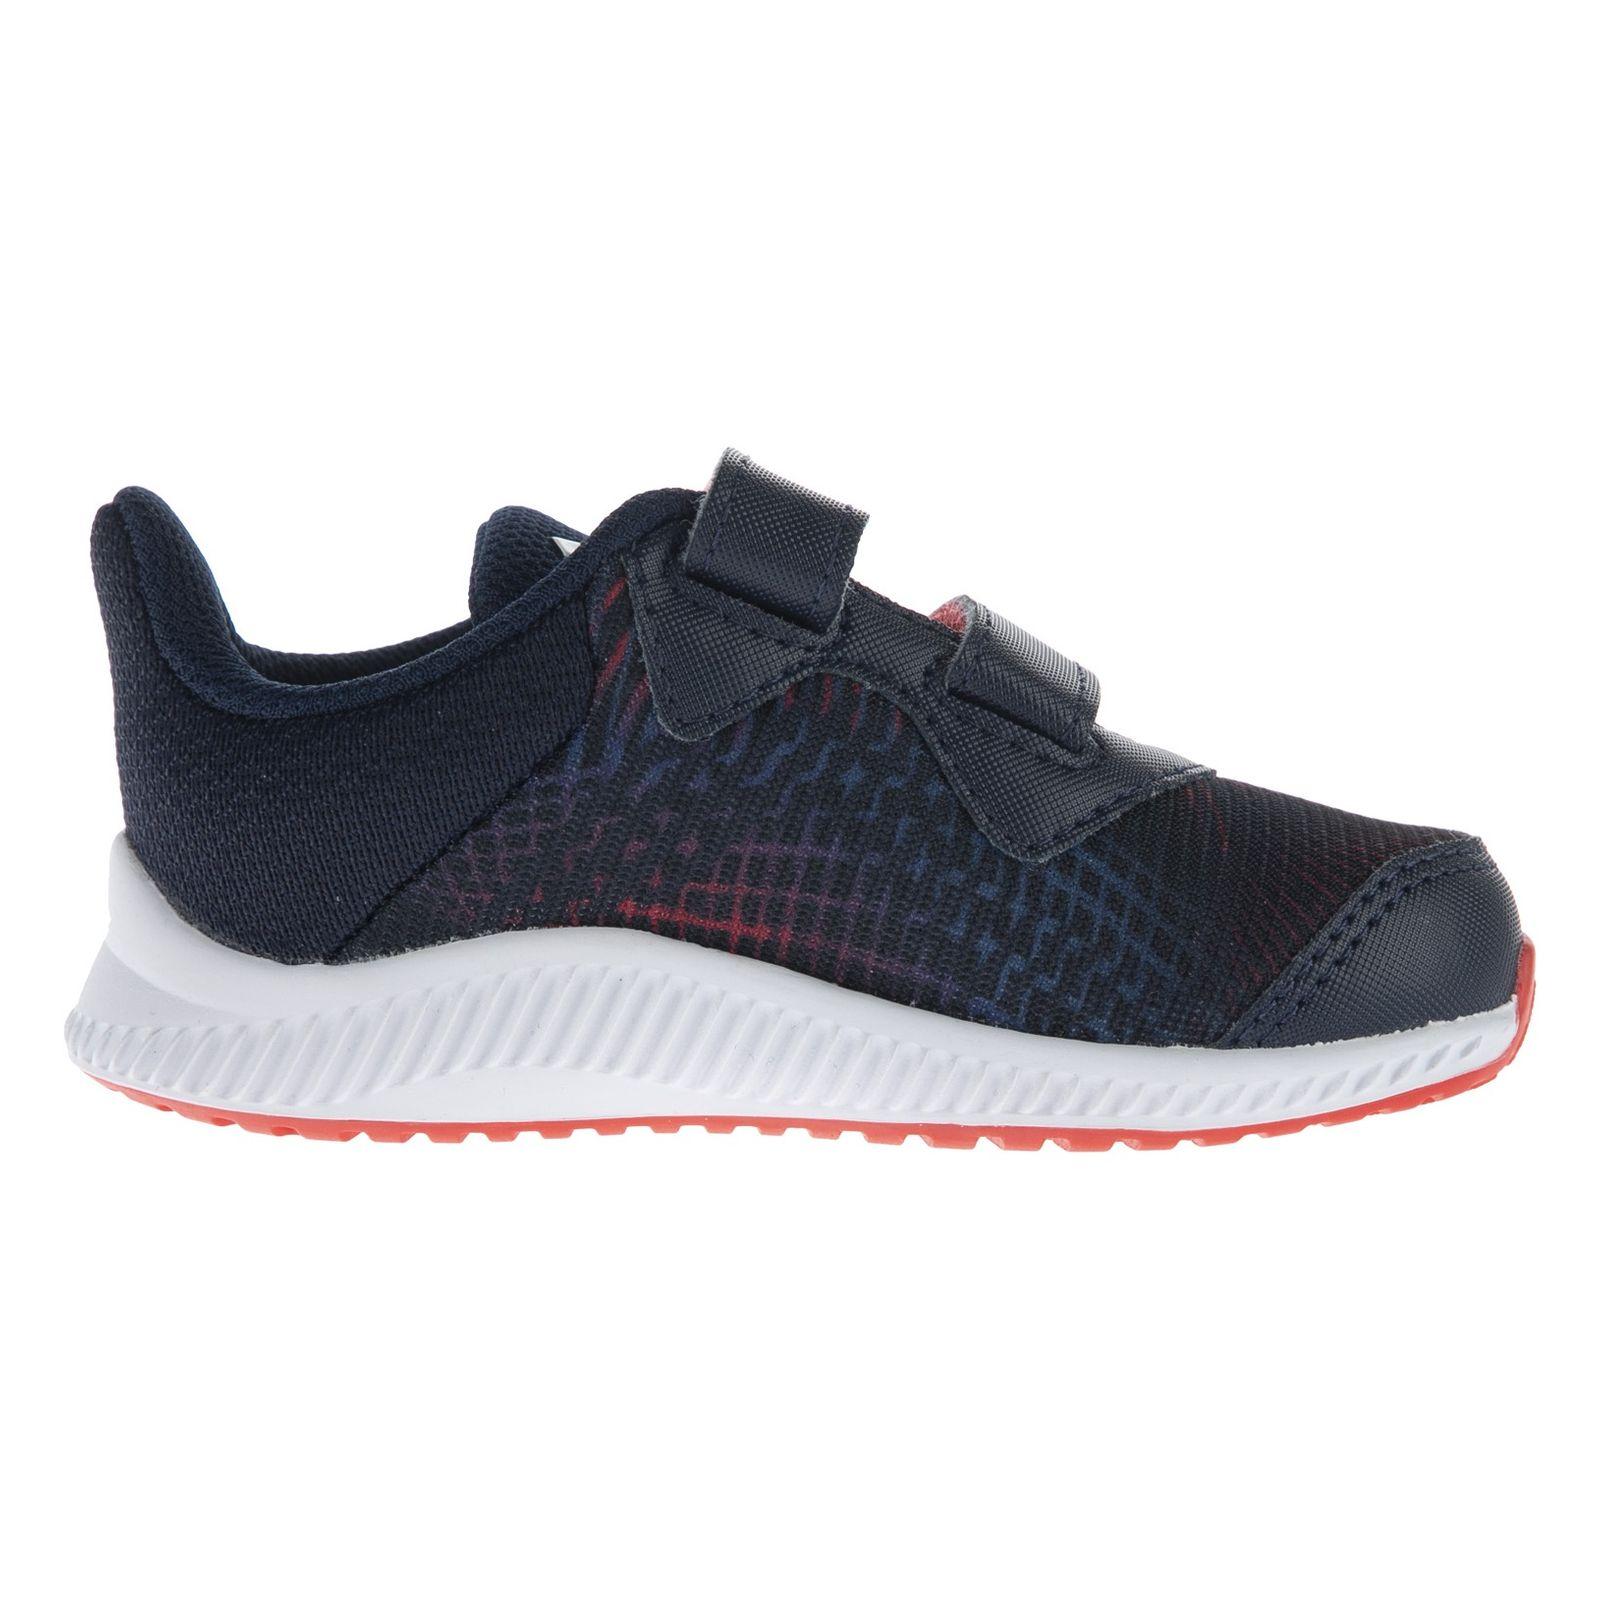 کفش مخصوص دویدن پسرانه آدیداس مدل Forta run CF -  - 2